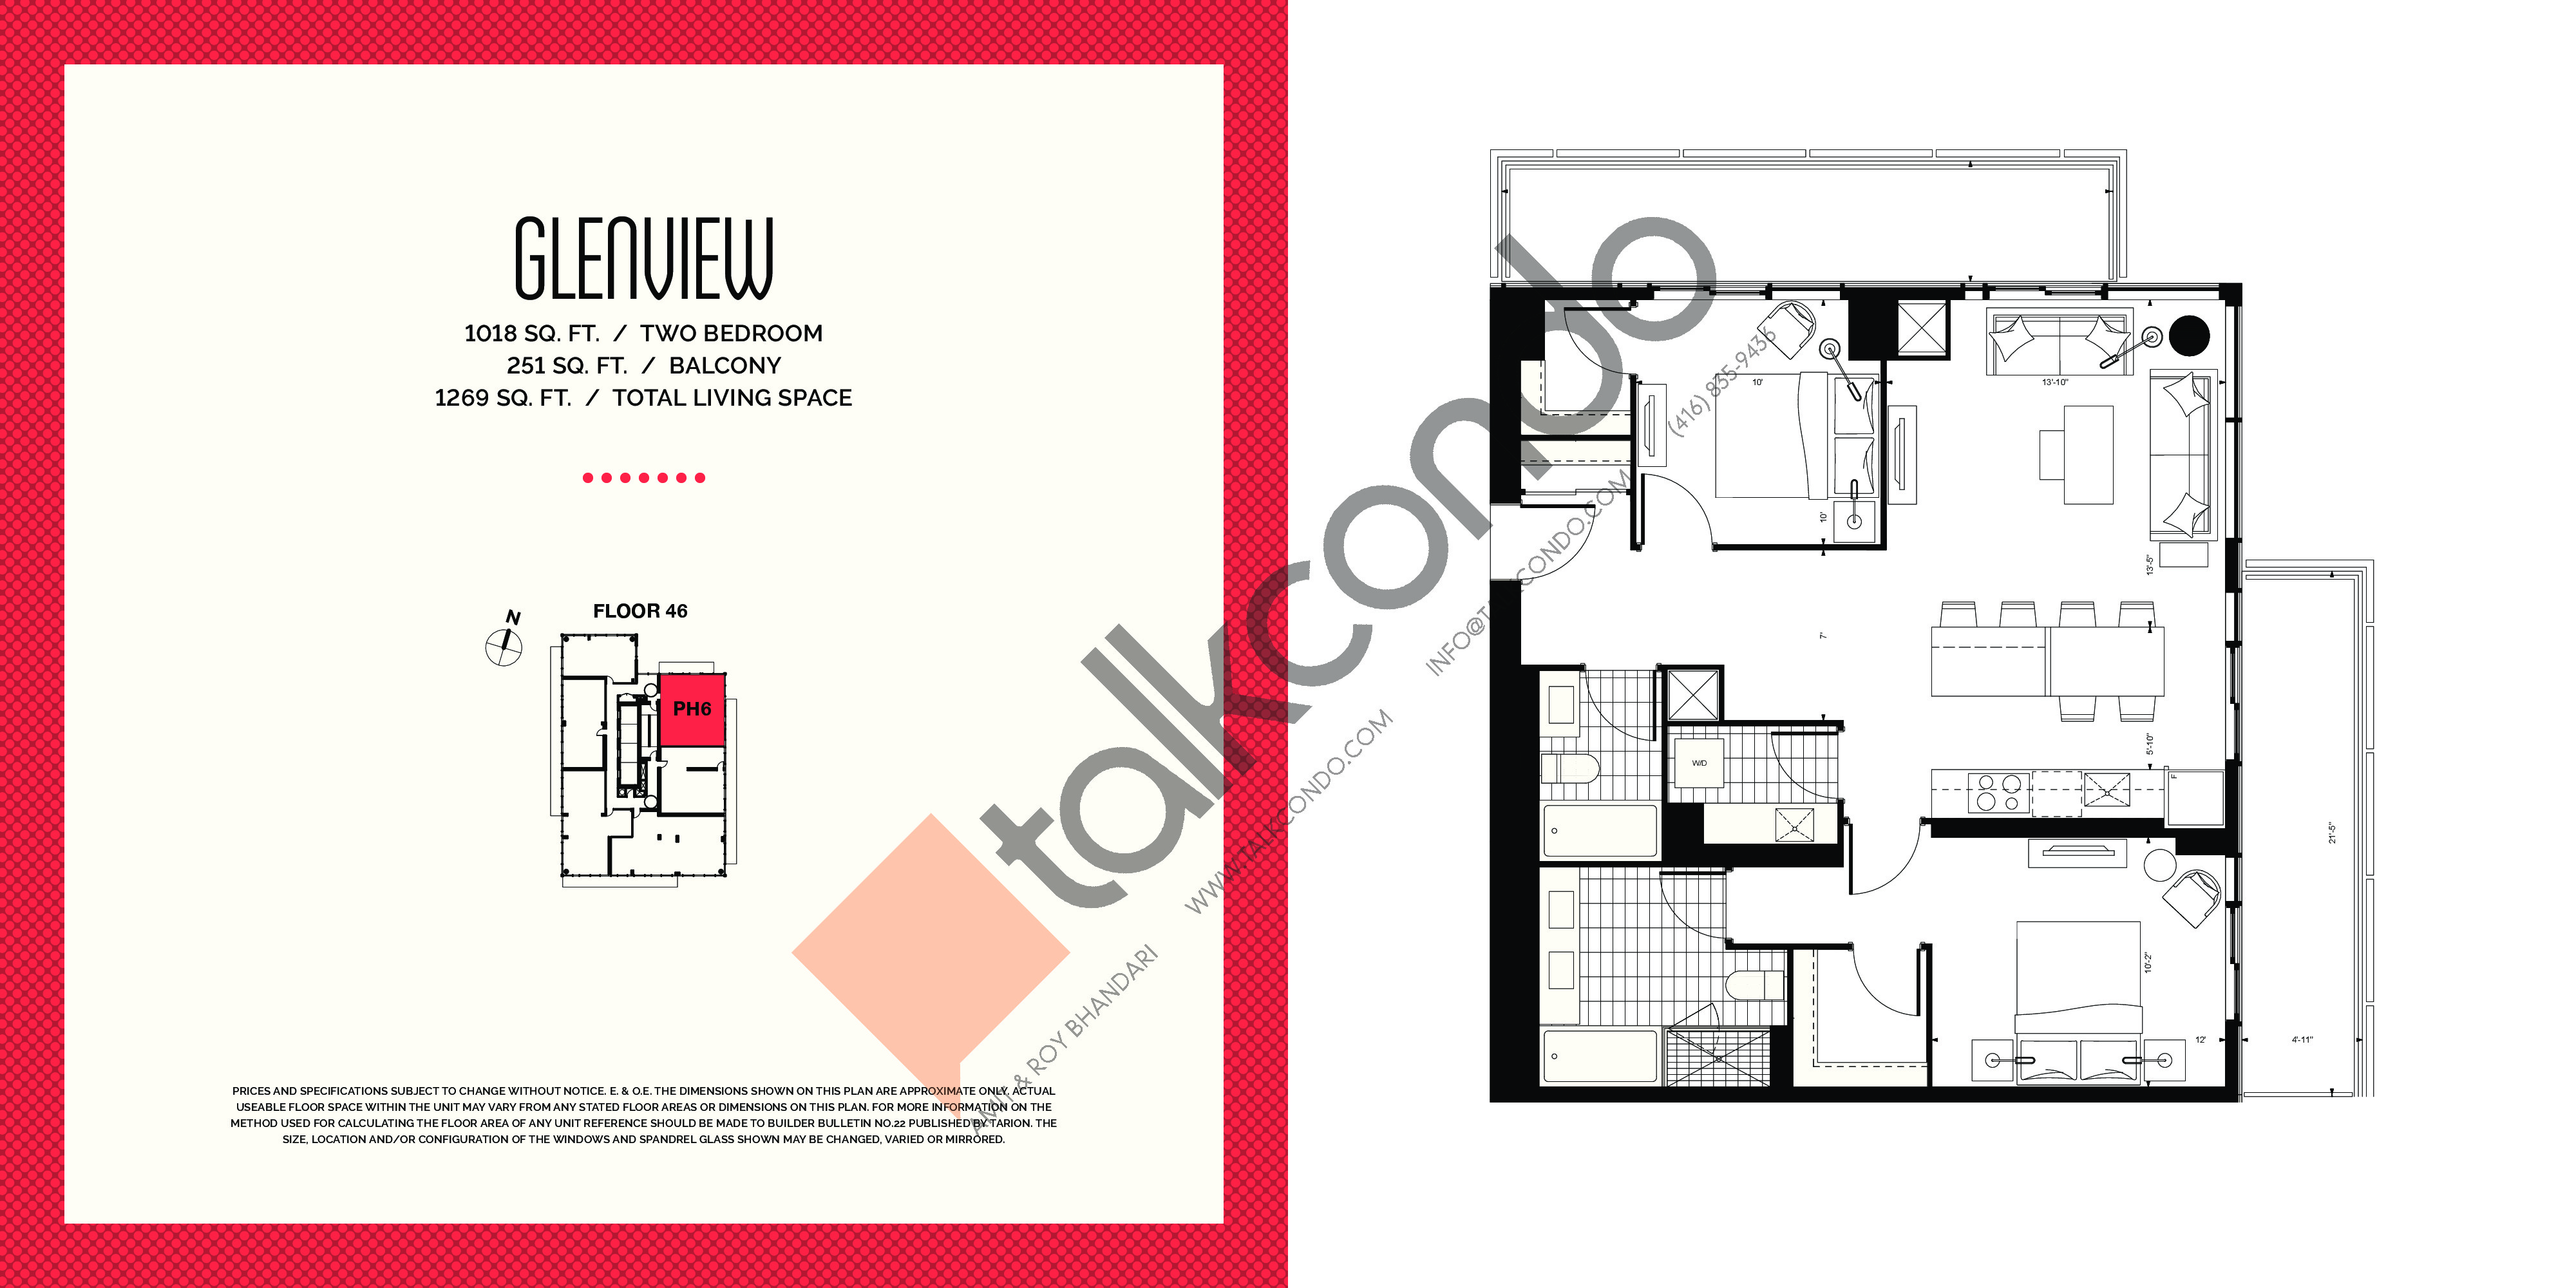 Glenview Floor Plan at E2 Condos - 1018 sq.ft